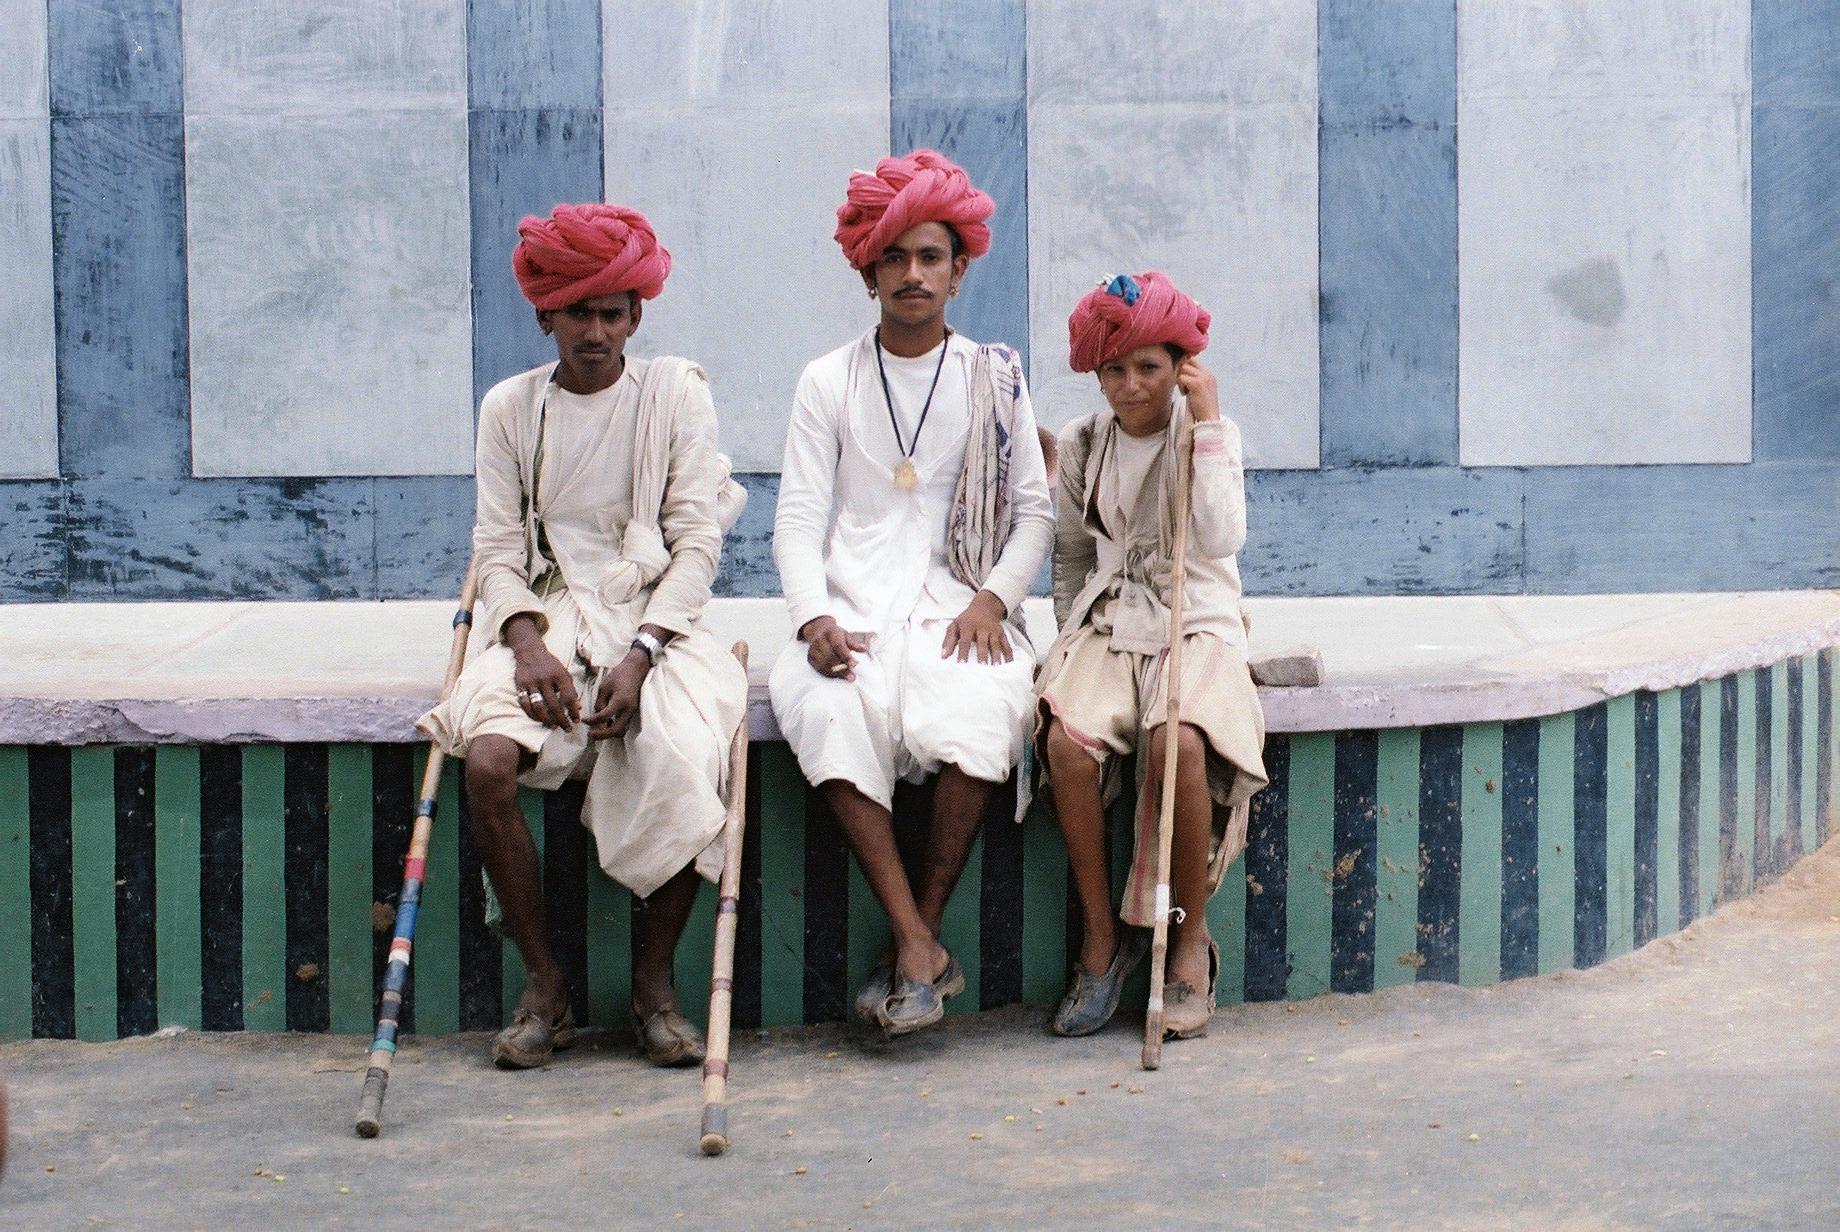 43. Rajasthan